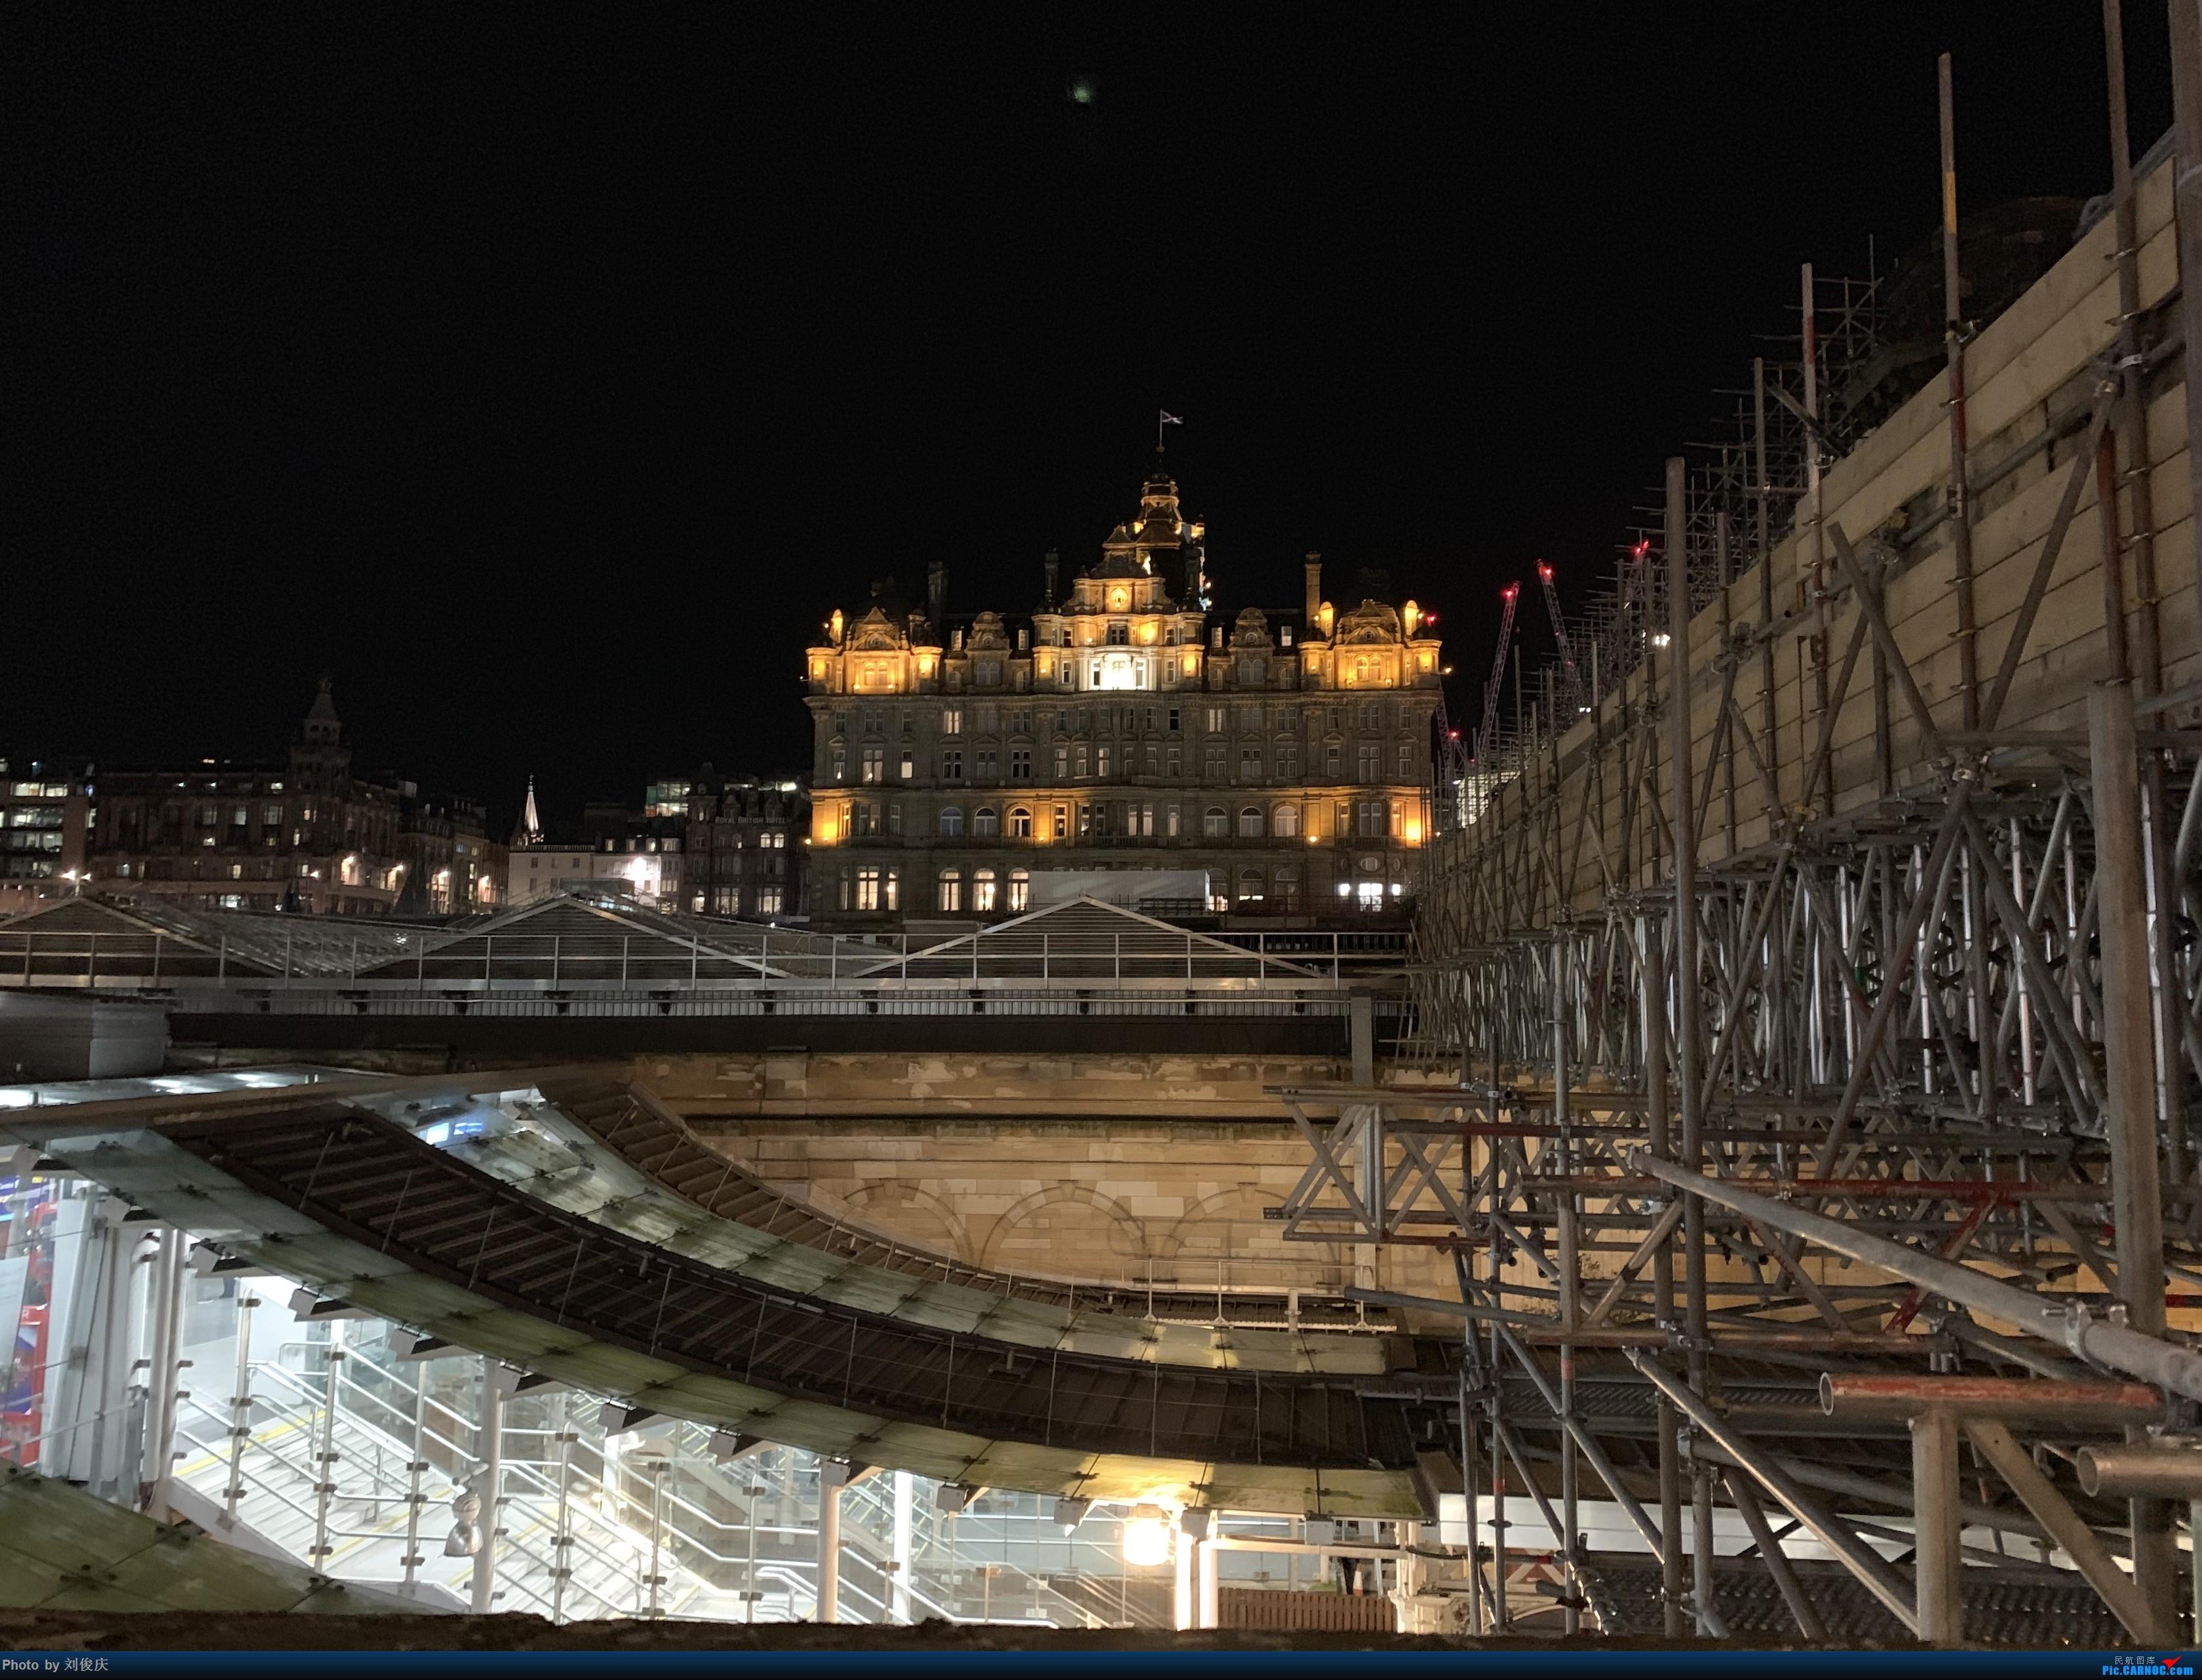 Re:[原创]SEA-JFK-LHR-CDG-FCO-CDG-LHR-ATL-SEA 8天3国5城暴走游记 [4月11日-更新至LHR] EDINBURGH WAVERLEY STATION  Edinburgh Waverley Station